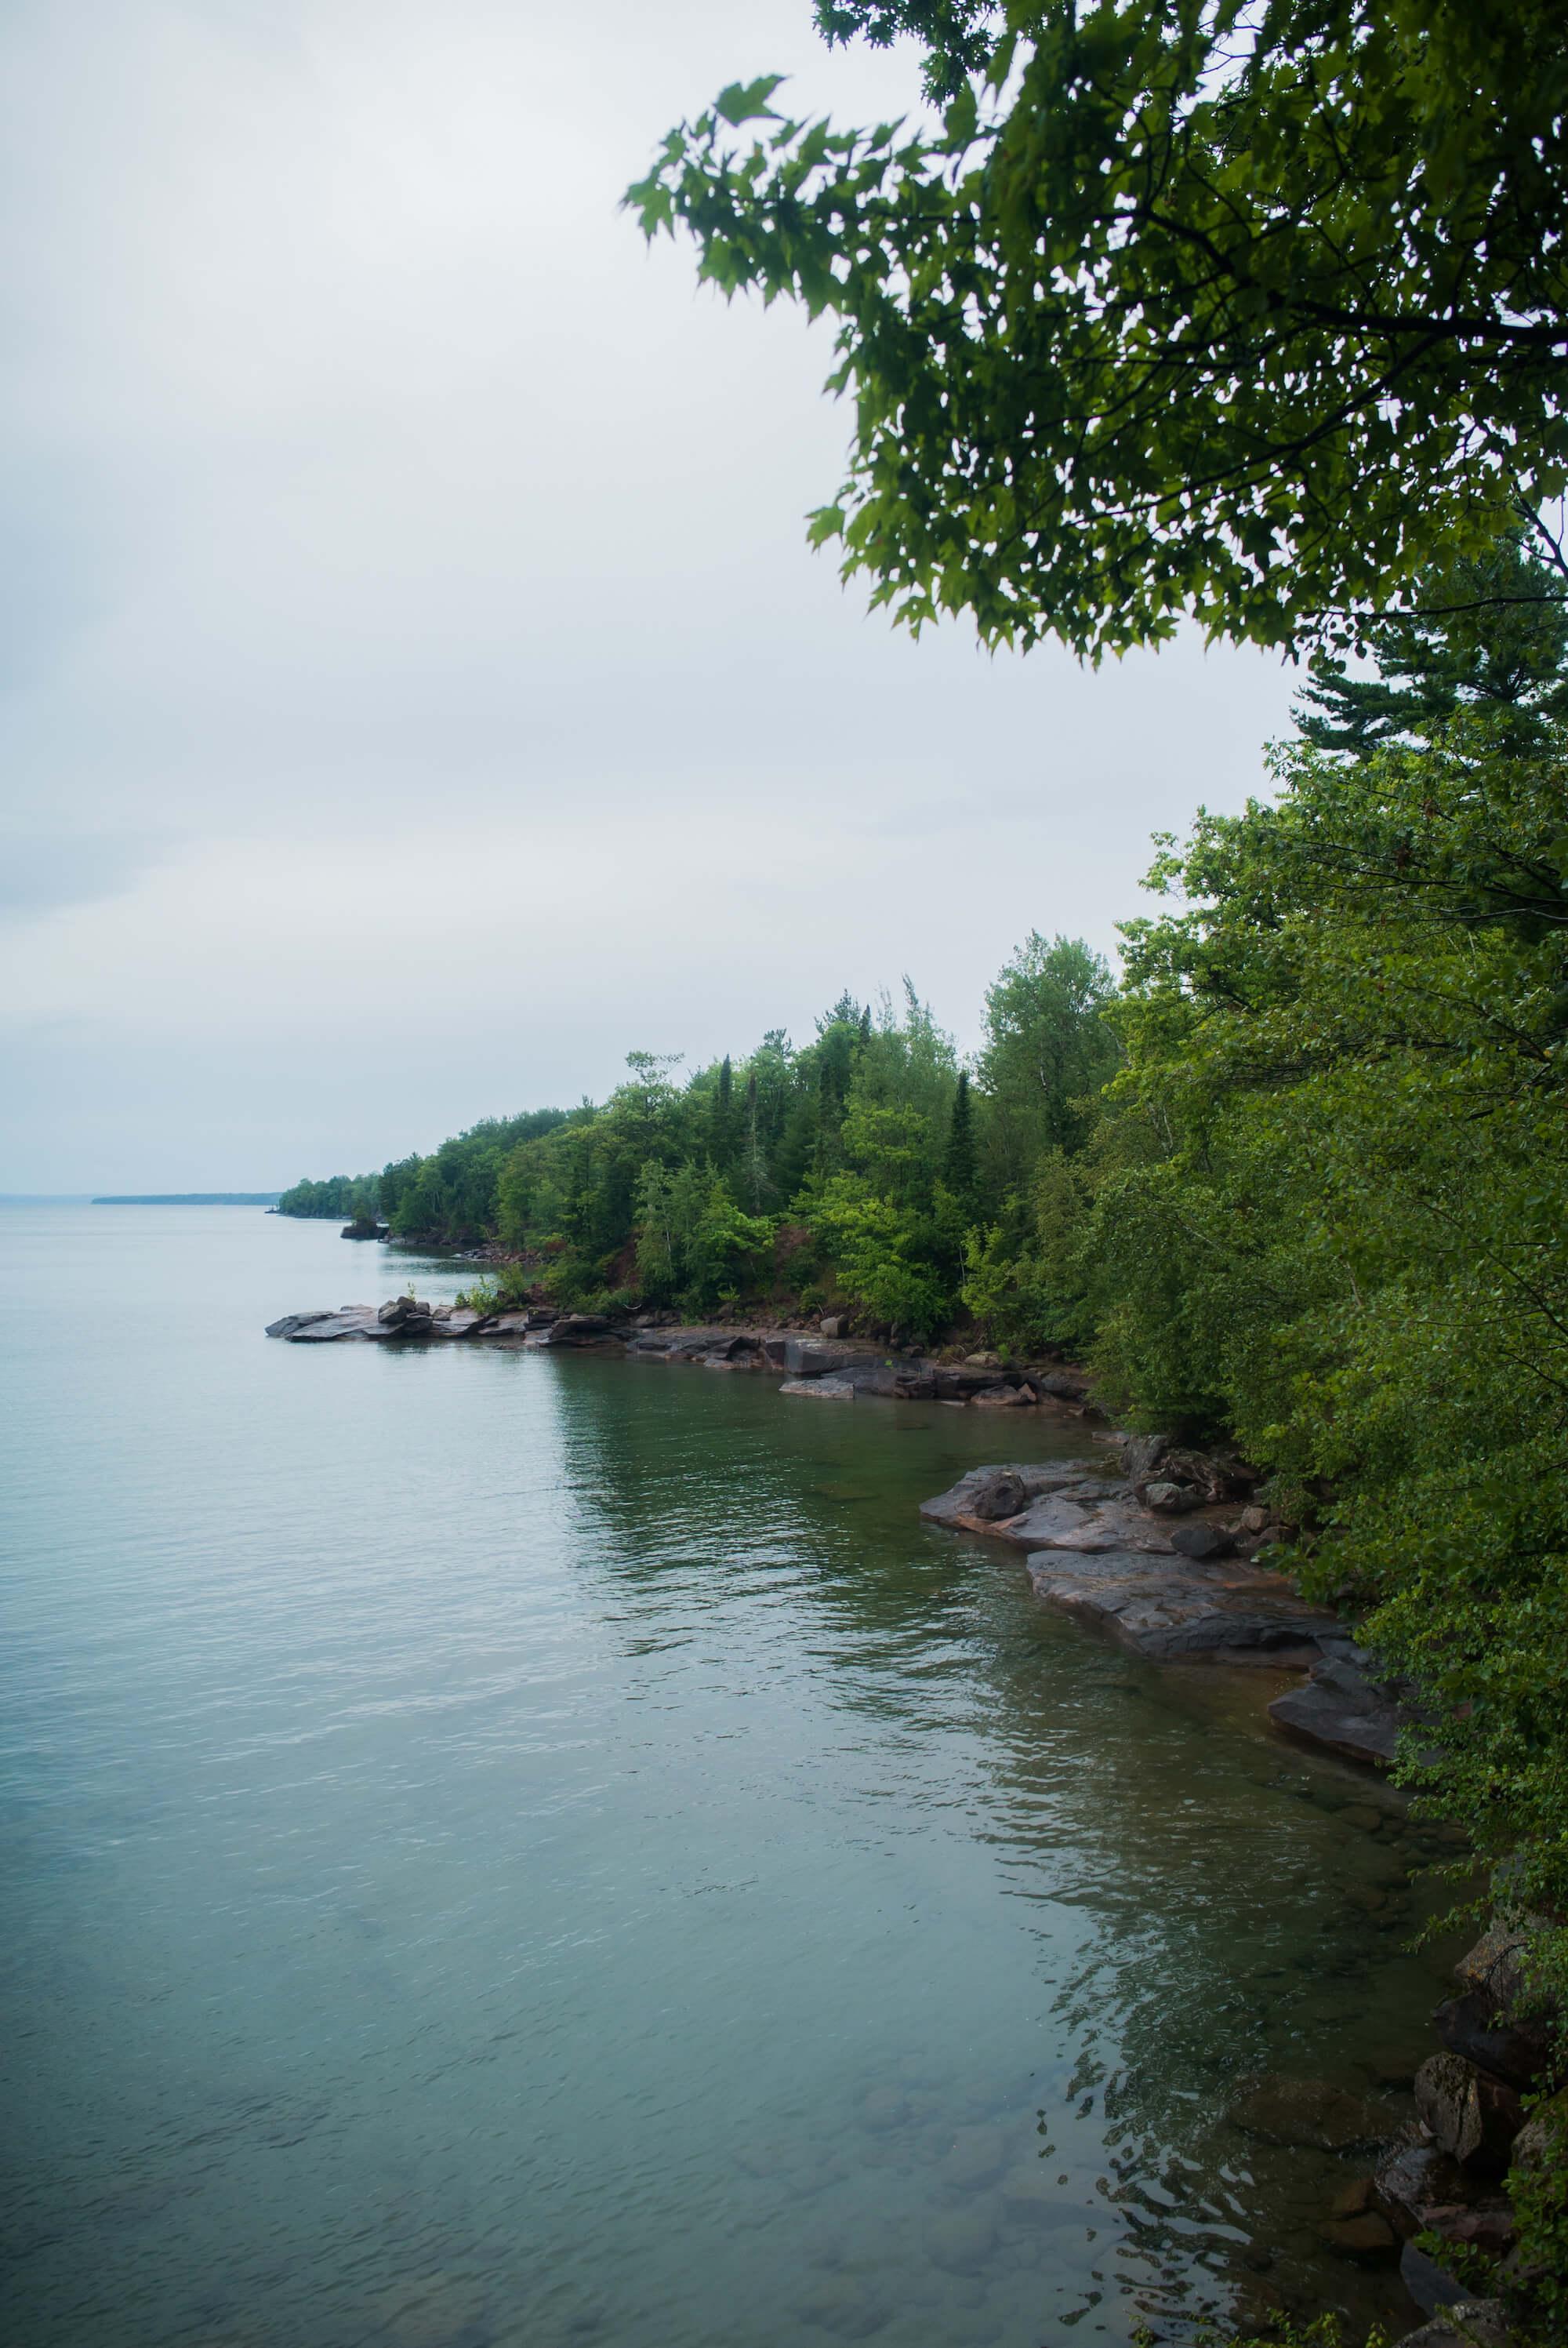 engle-olson-photography-madeline-island-33.jpg